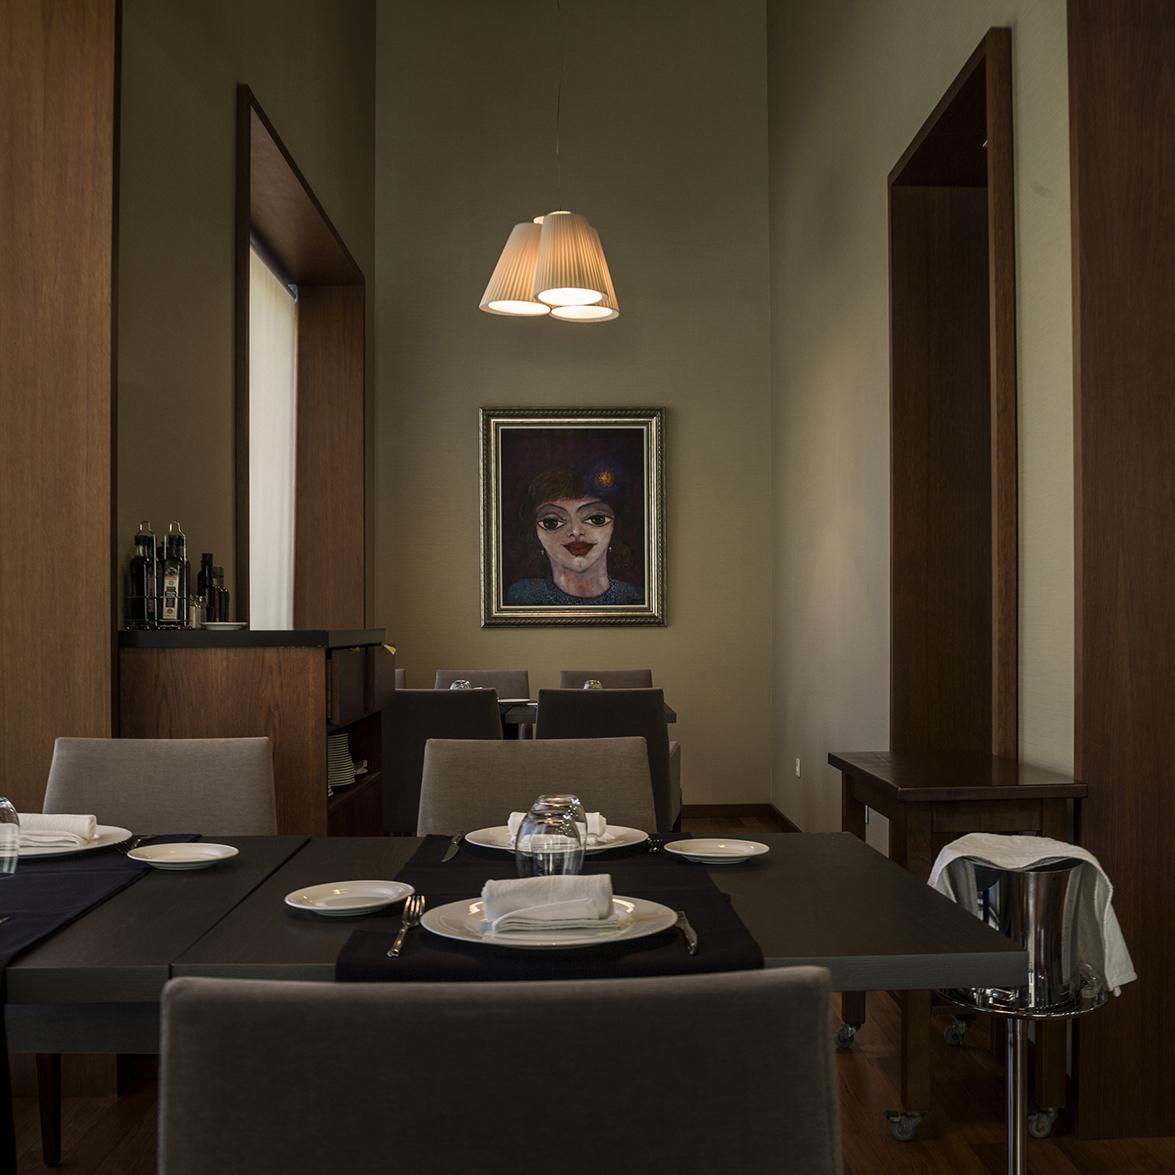 florinda-3-sospensione-by-modoluce-juan-lax-restaurant-in-murcia-2